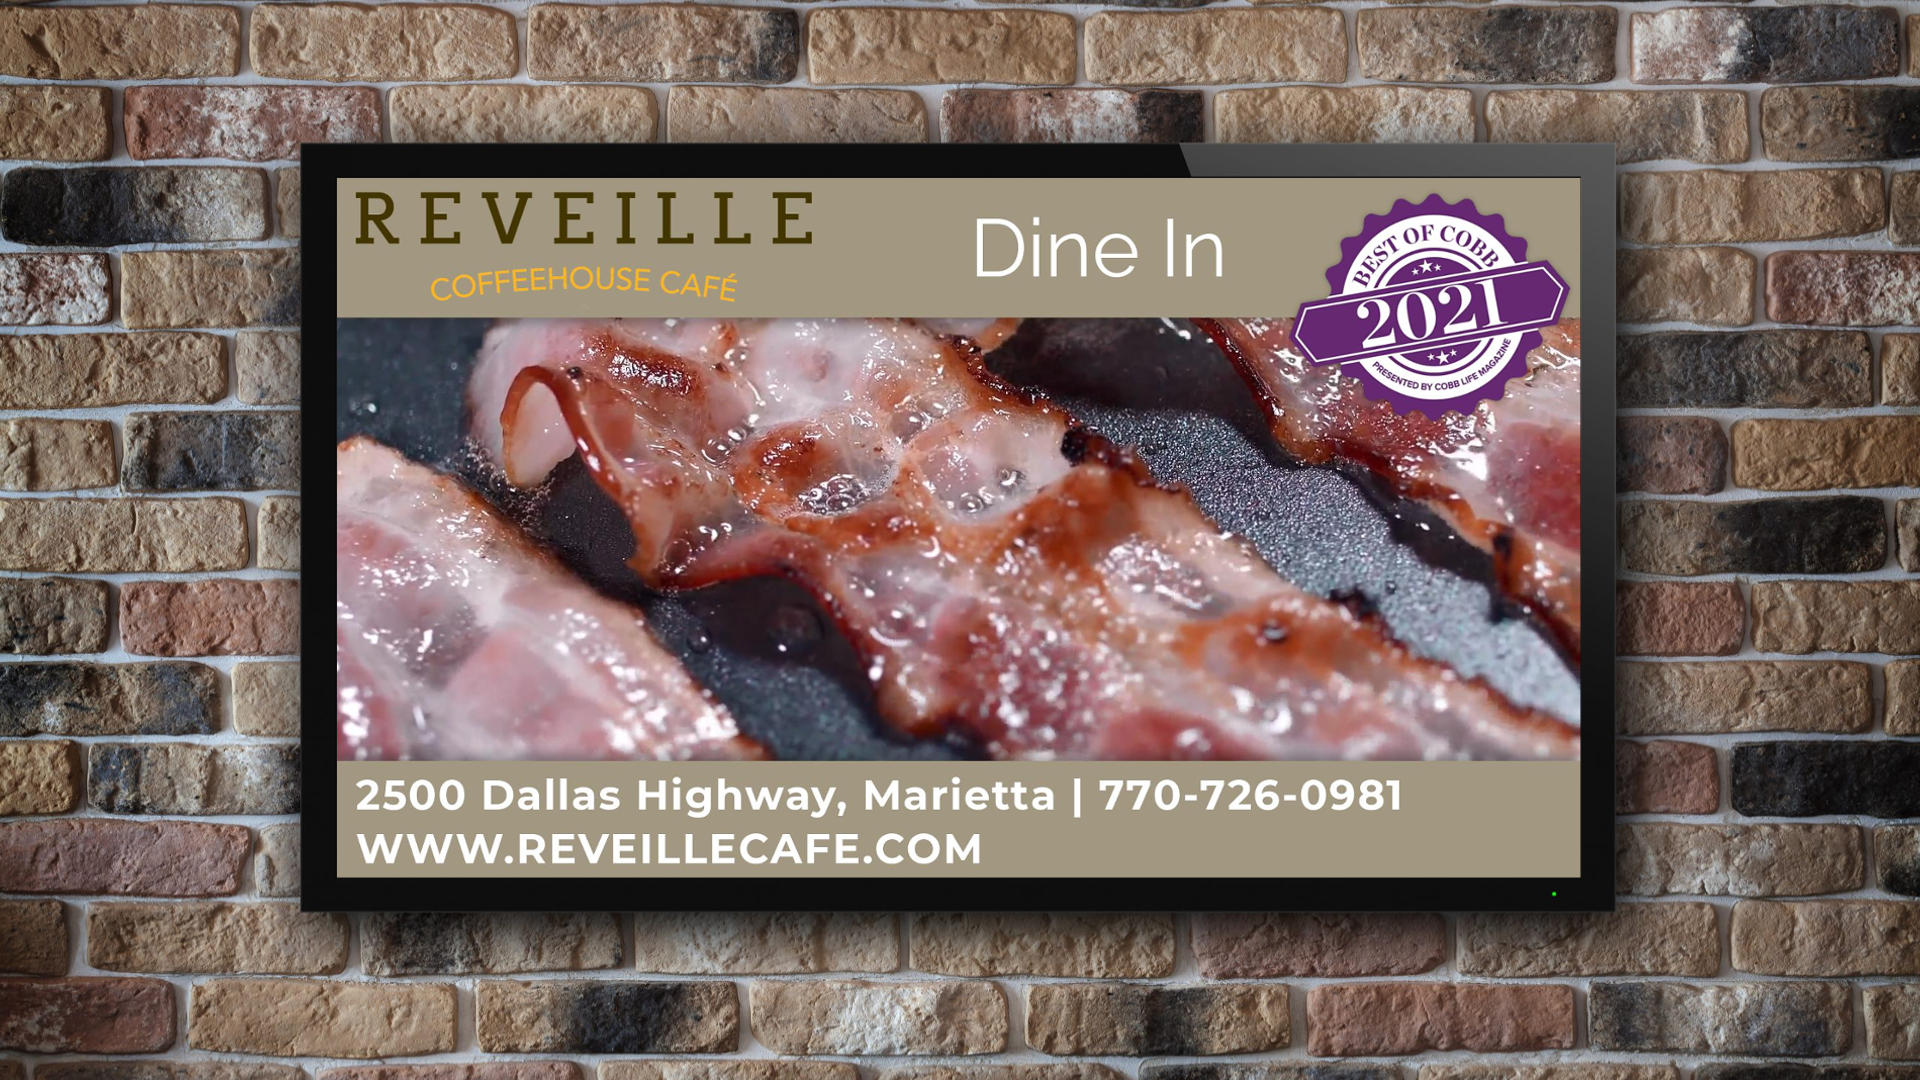 Reveille Cafe West Cobb - Digital Signage Video Ads